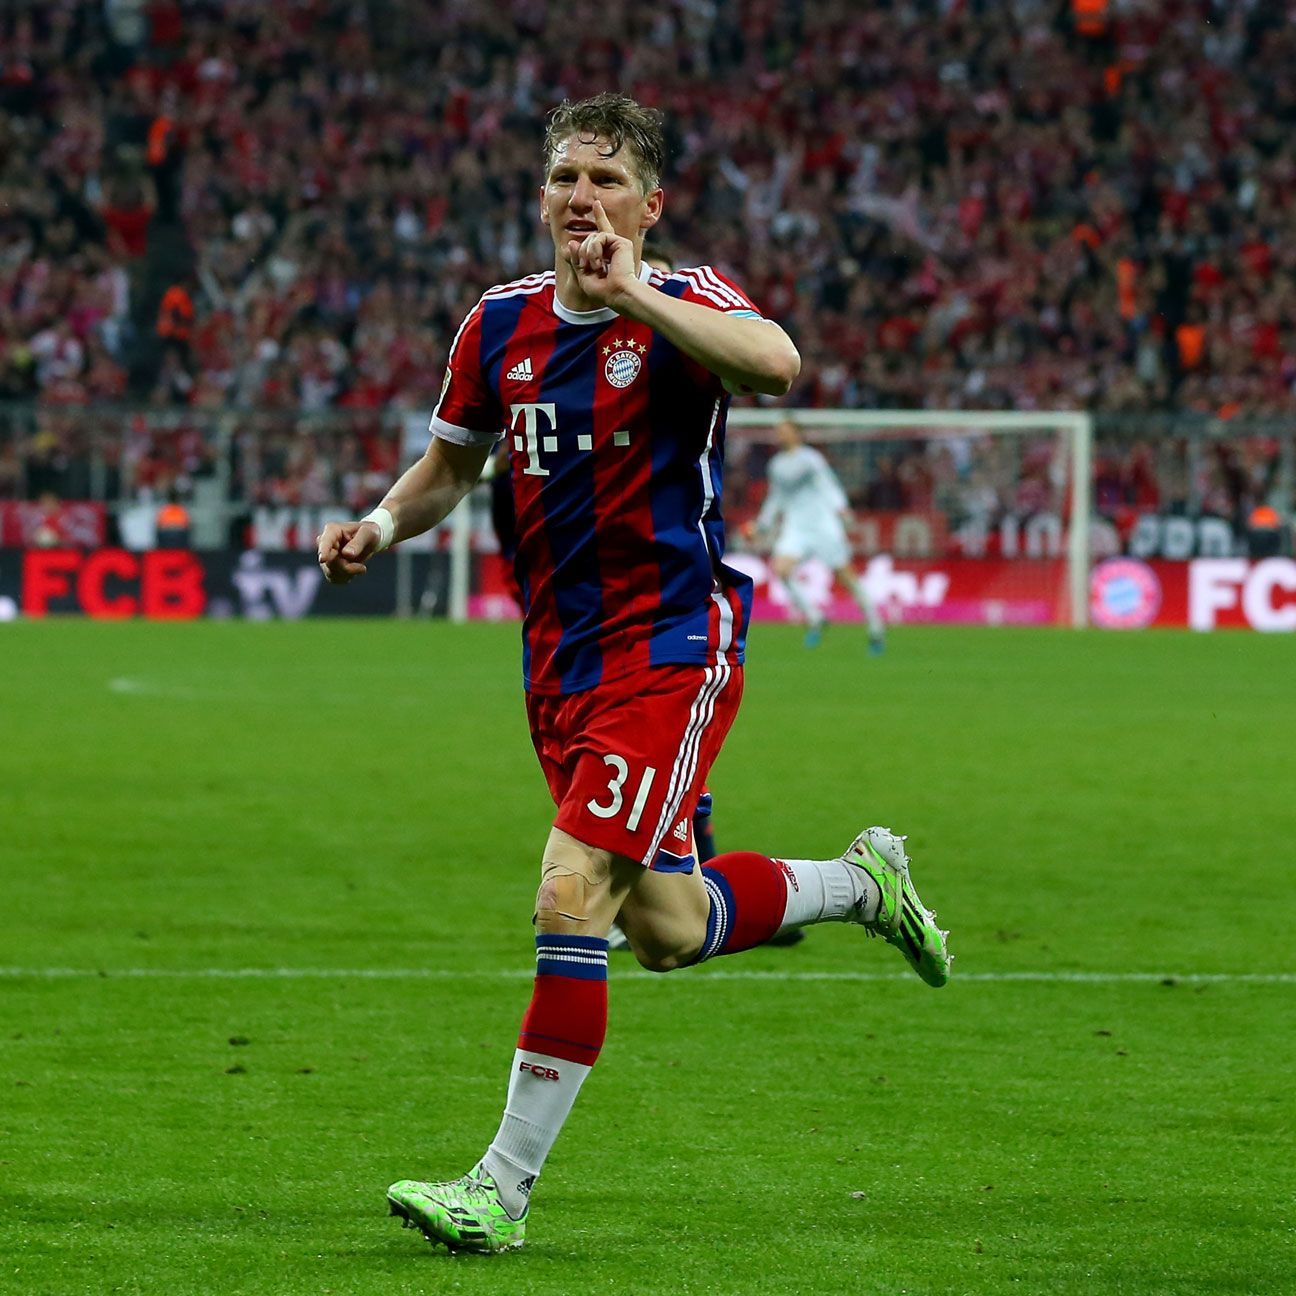 Bastian Schweinsteiger's goal put Bayern on the cusp of clinching another Bundesliga title.